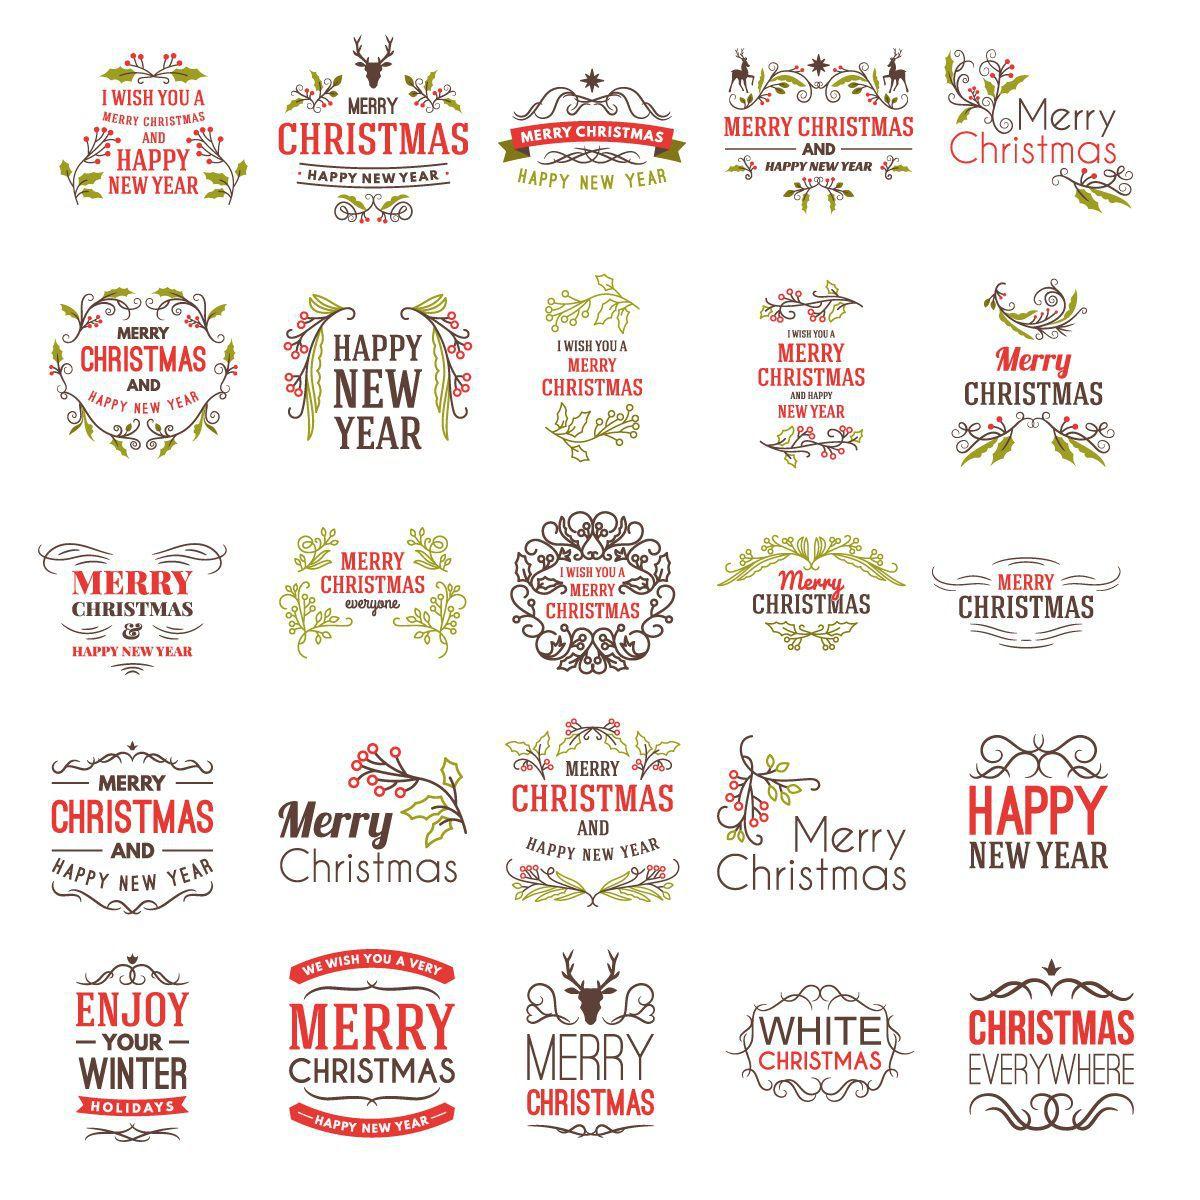 000 Awesome Free Addres Label Template Christma Sample  Christmas Return 30 Per Sheet Microsoft WordFull